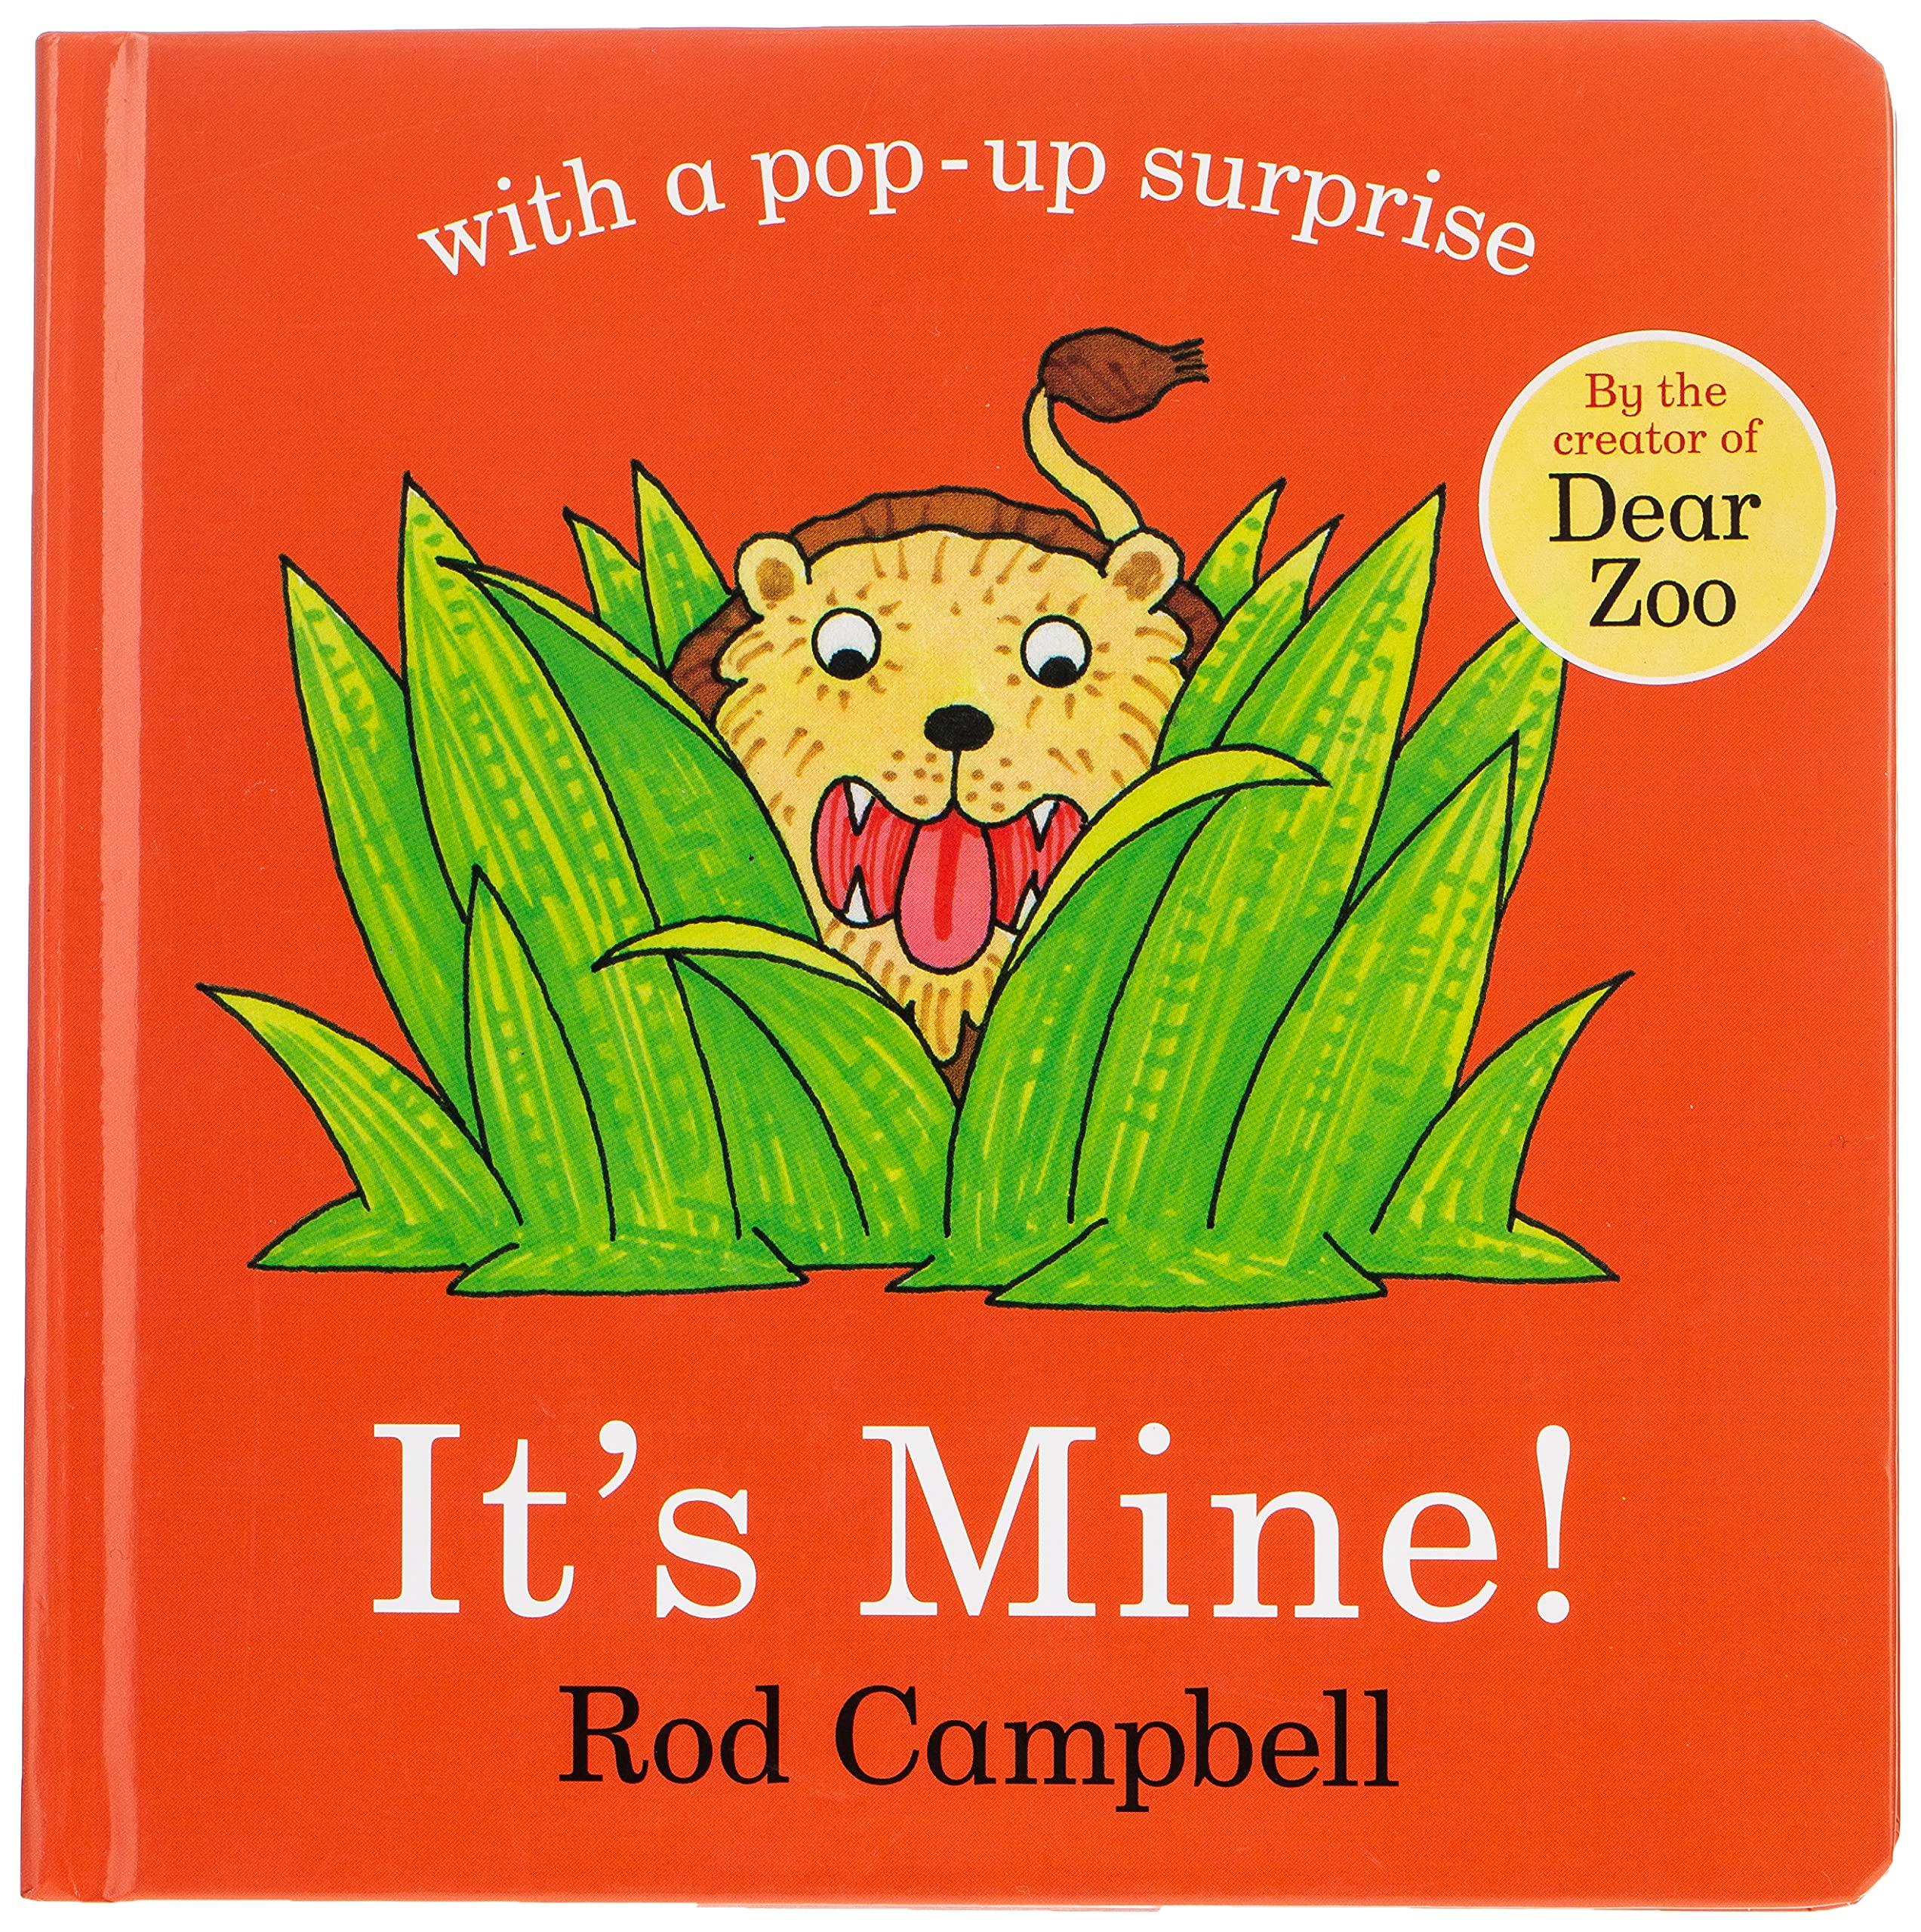 It's Mine! : Campbell, Rod: Amazon.co.uk: Books